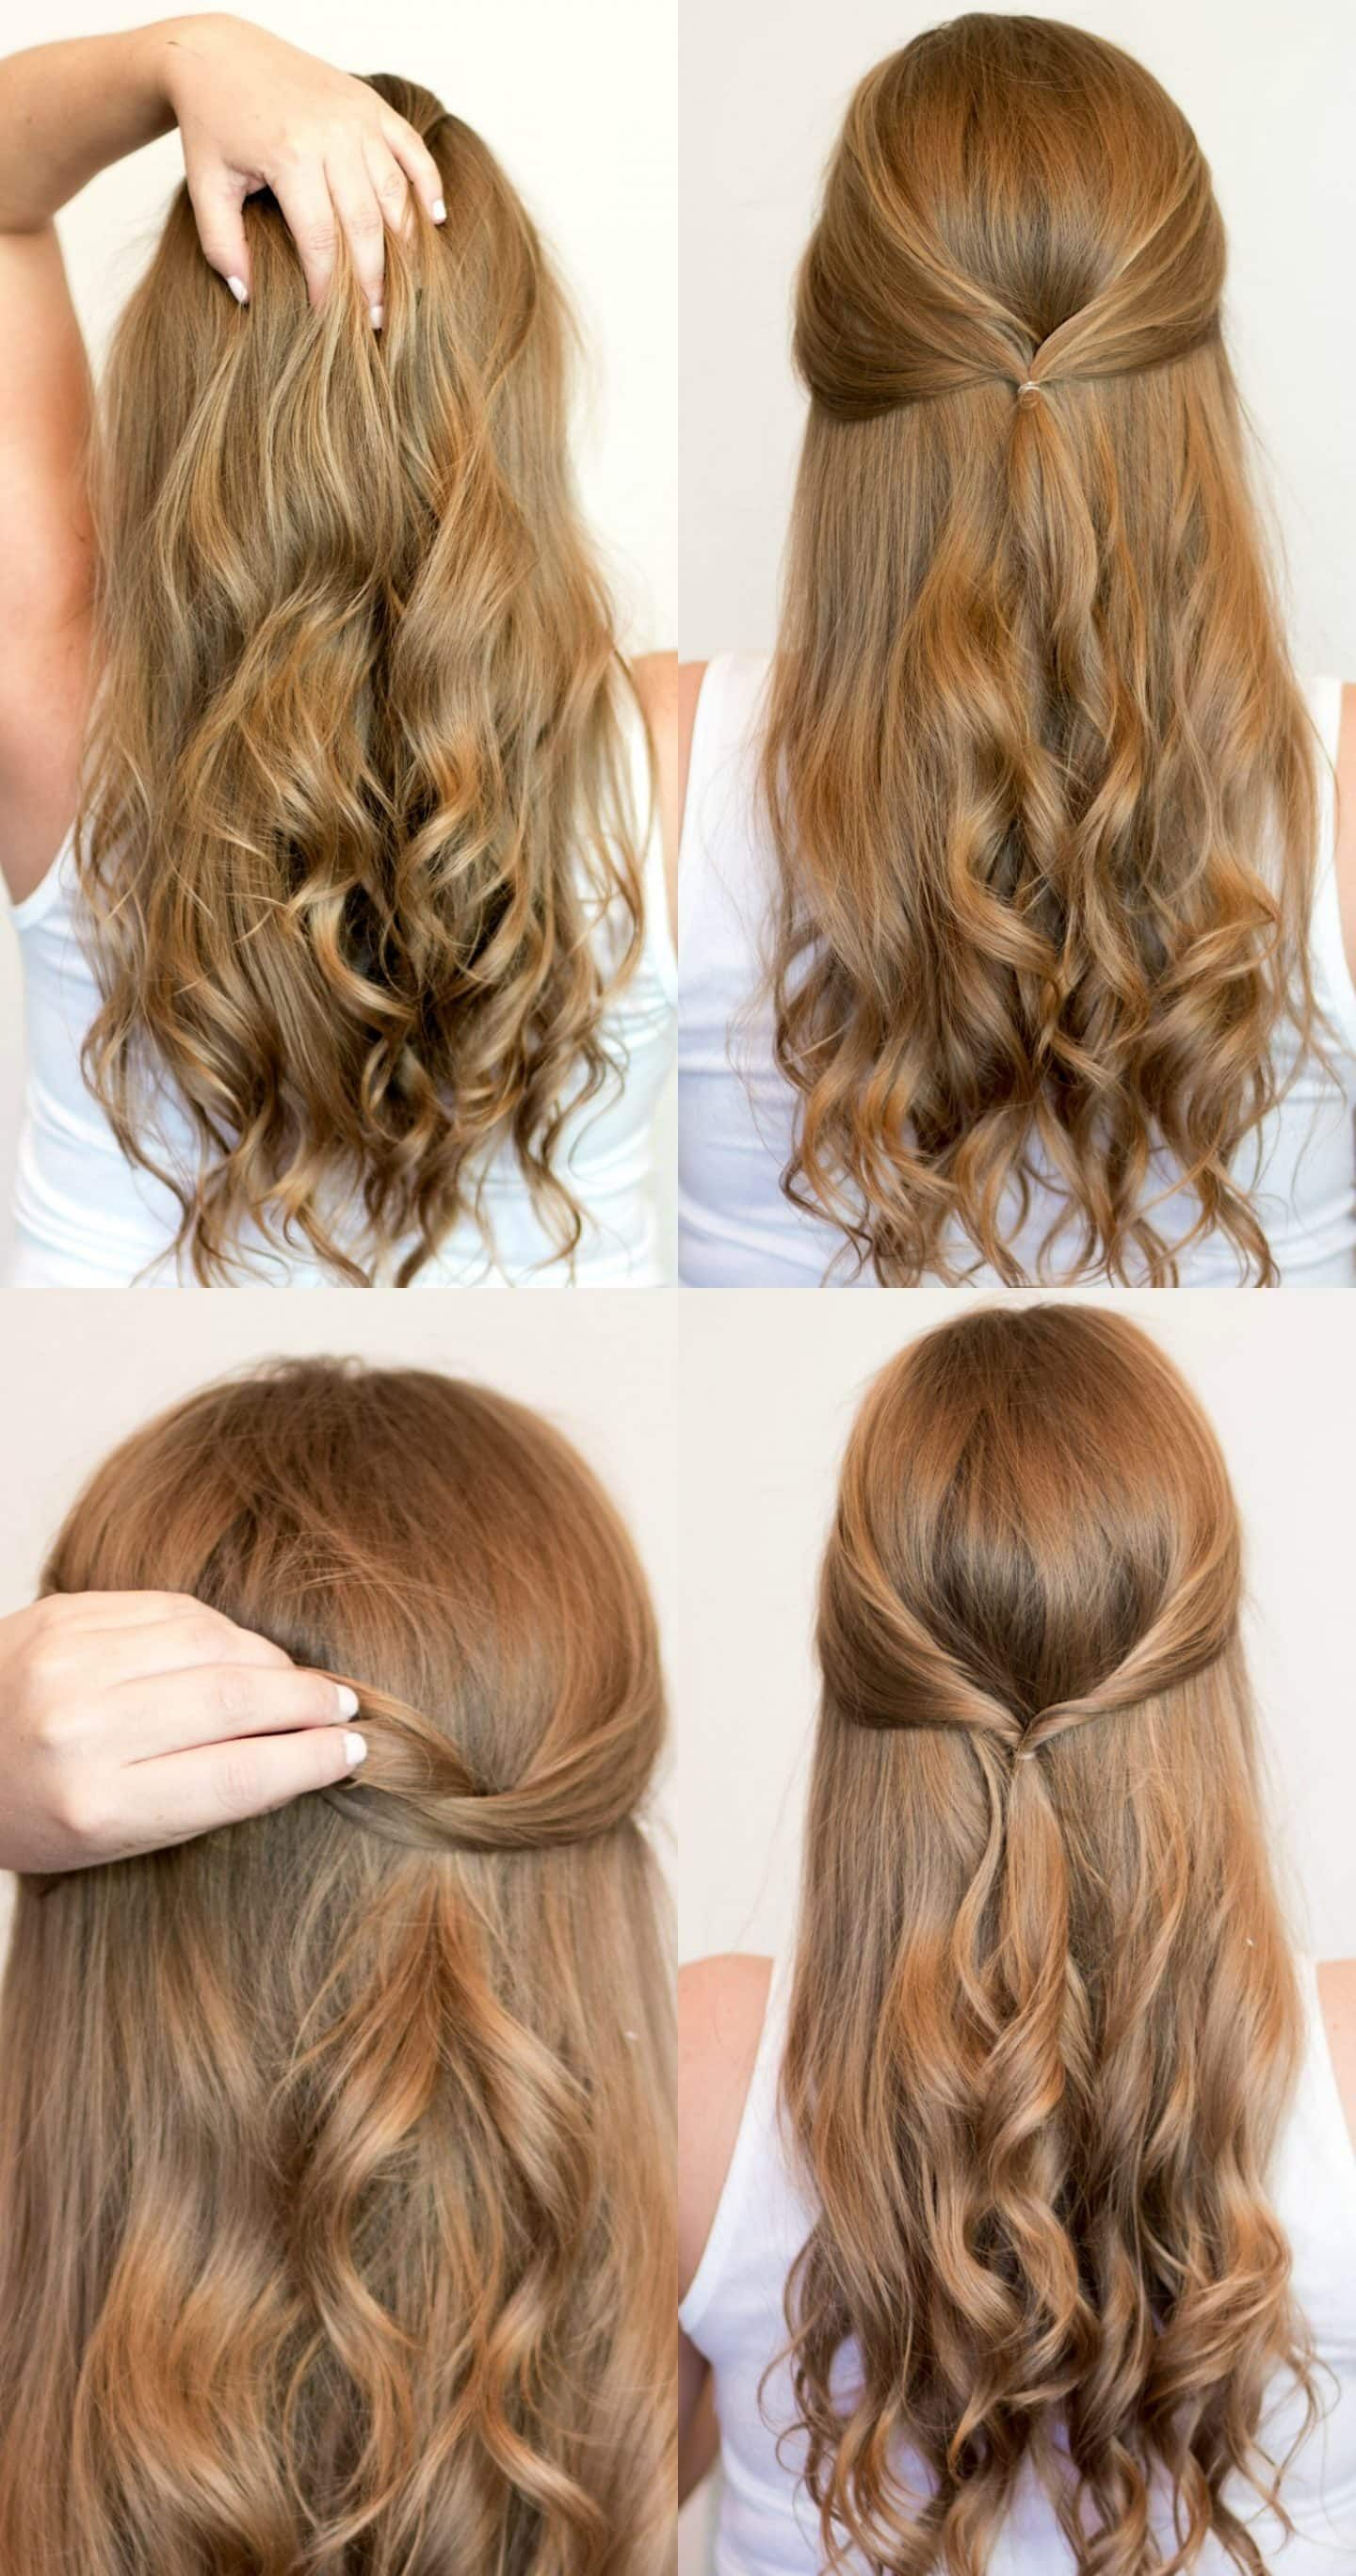 Easy Heatless Hairstyles For Long Hair Ashley Brooke Hair Easy Long Hairstyles H In 2020 Heatless Hairstyles Easy Hairstyles For Long Hair Long Hair Styles